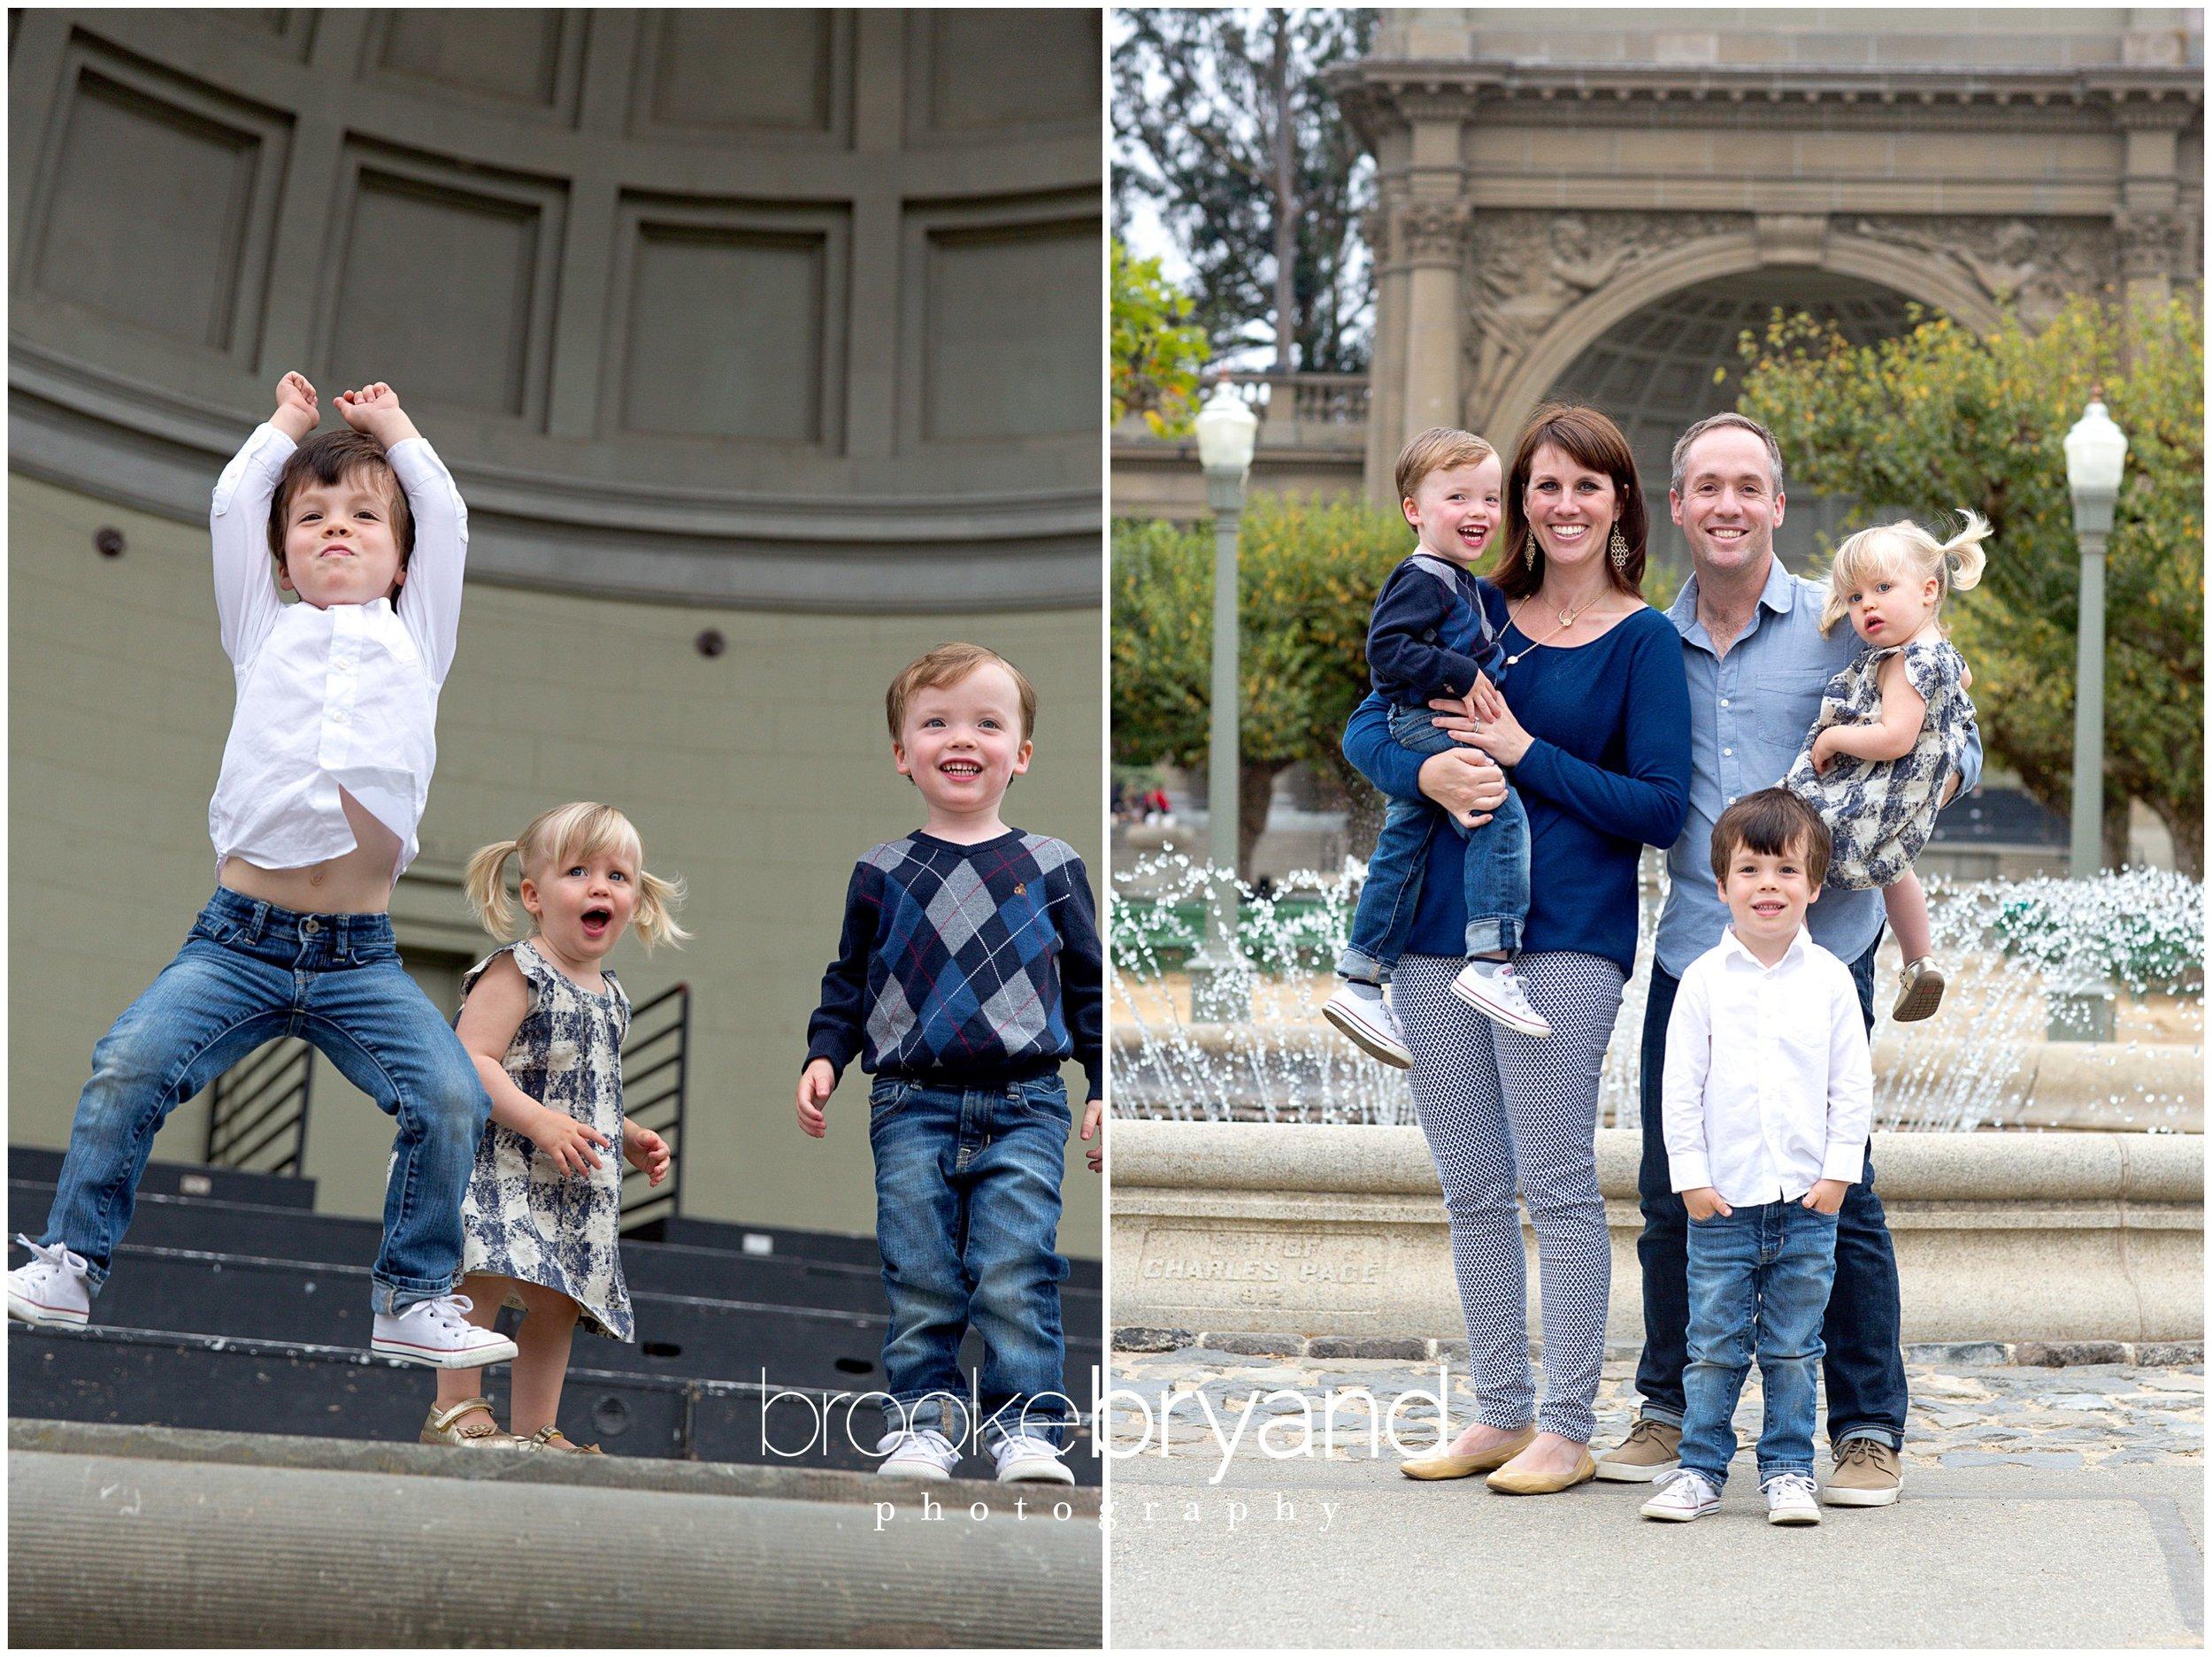 09.2014-Gallivan-golden-gate-park-family-photos-BBP_7413_San-Francisco-Family-Photos-Brooke-Bryand-Photography.jpg